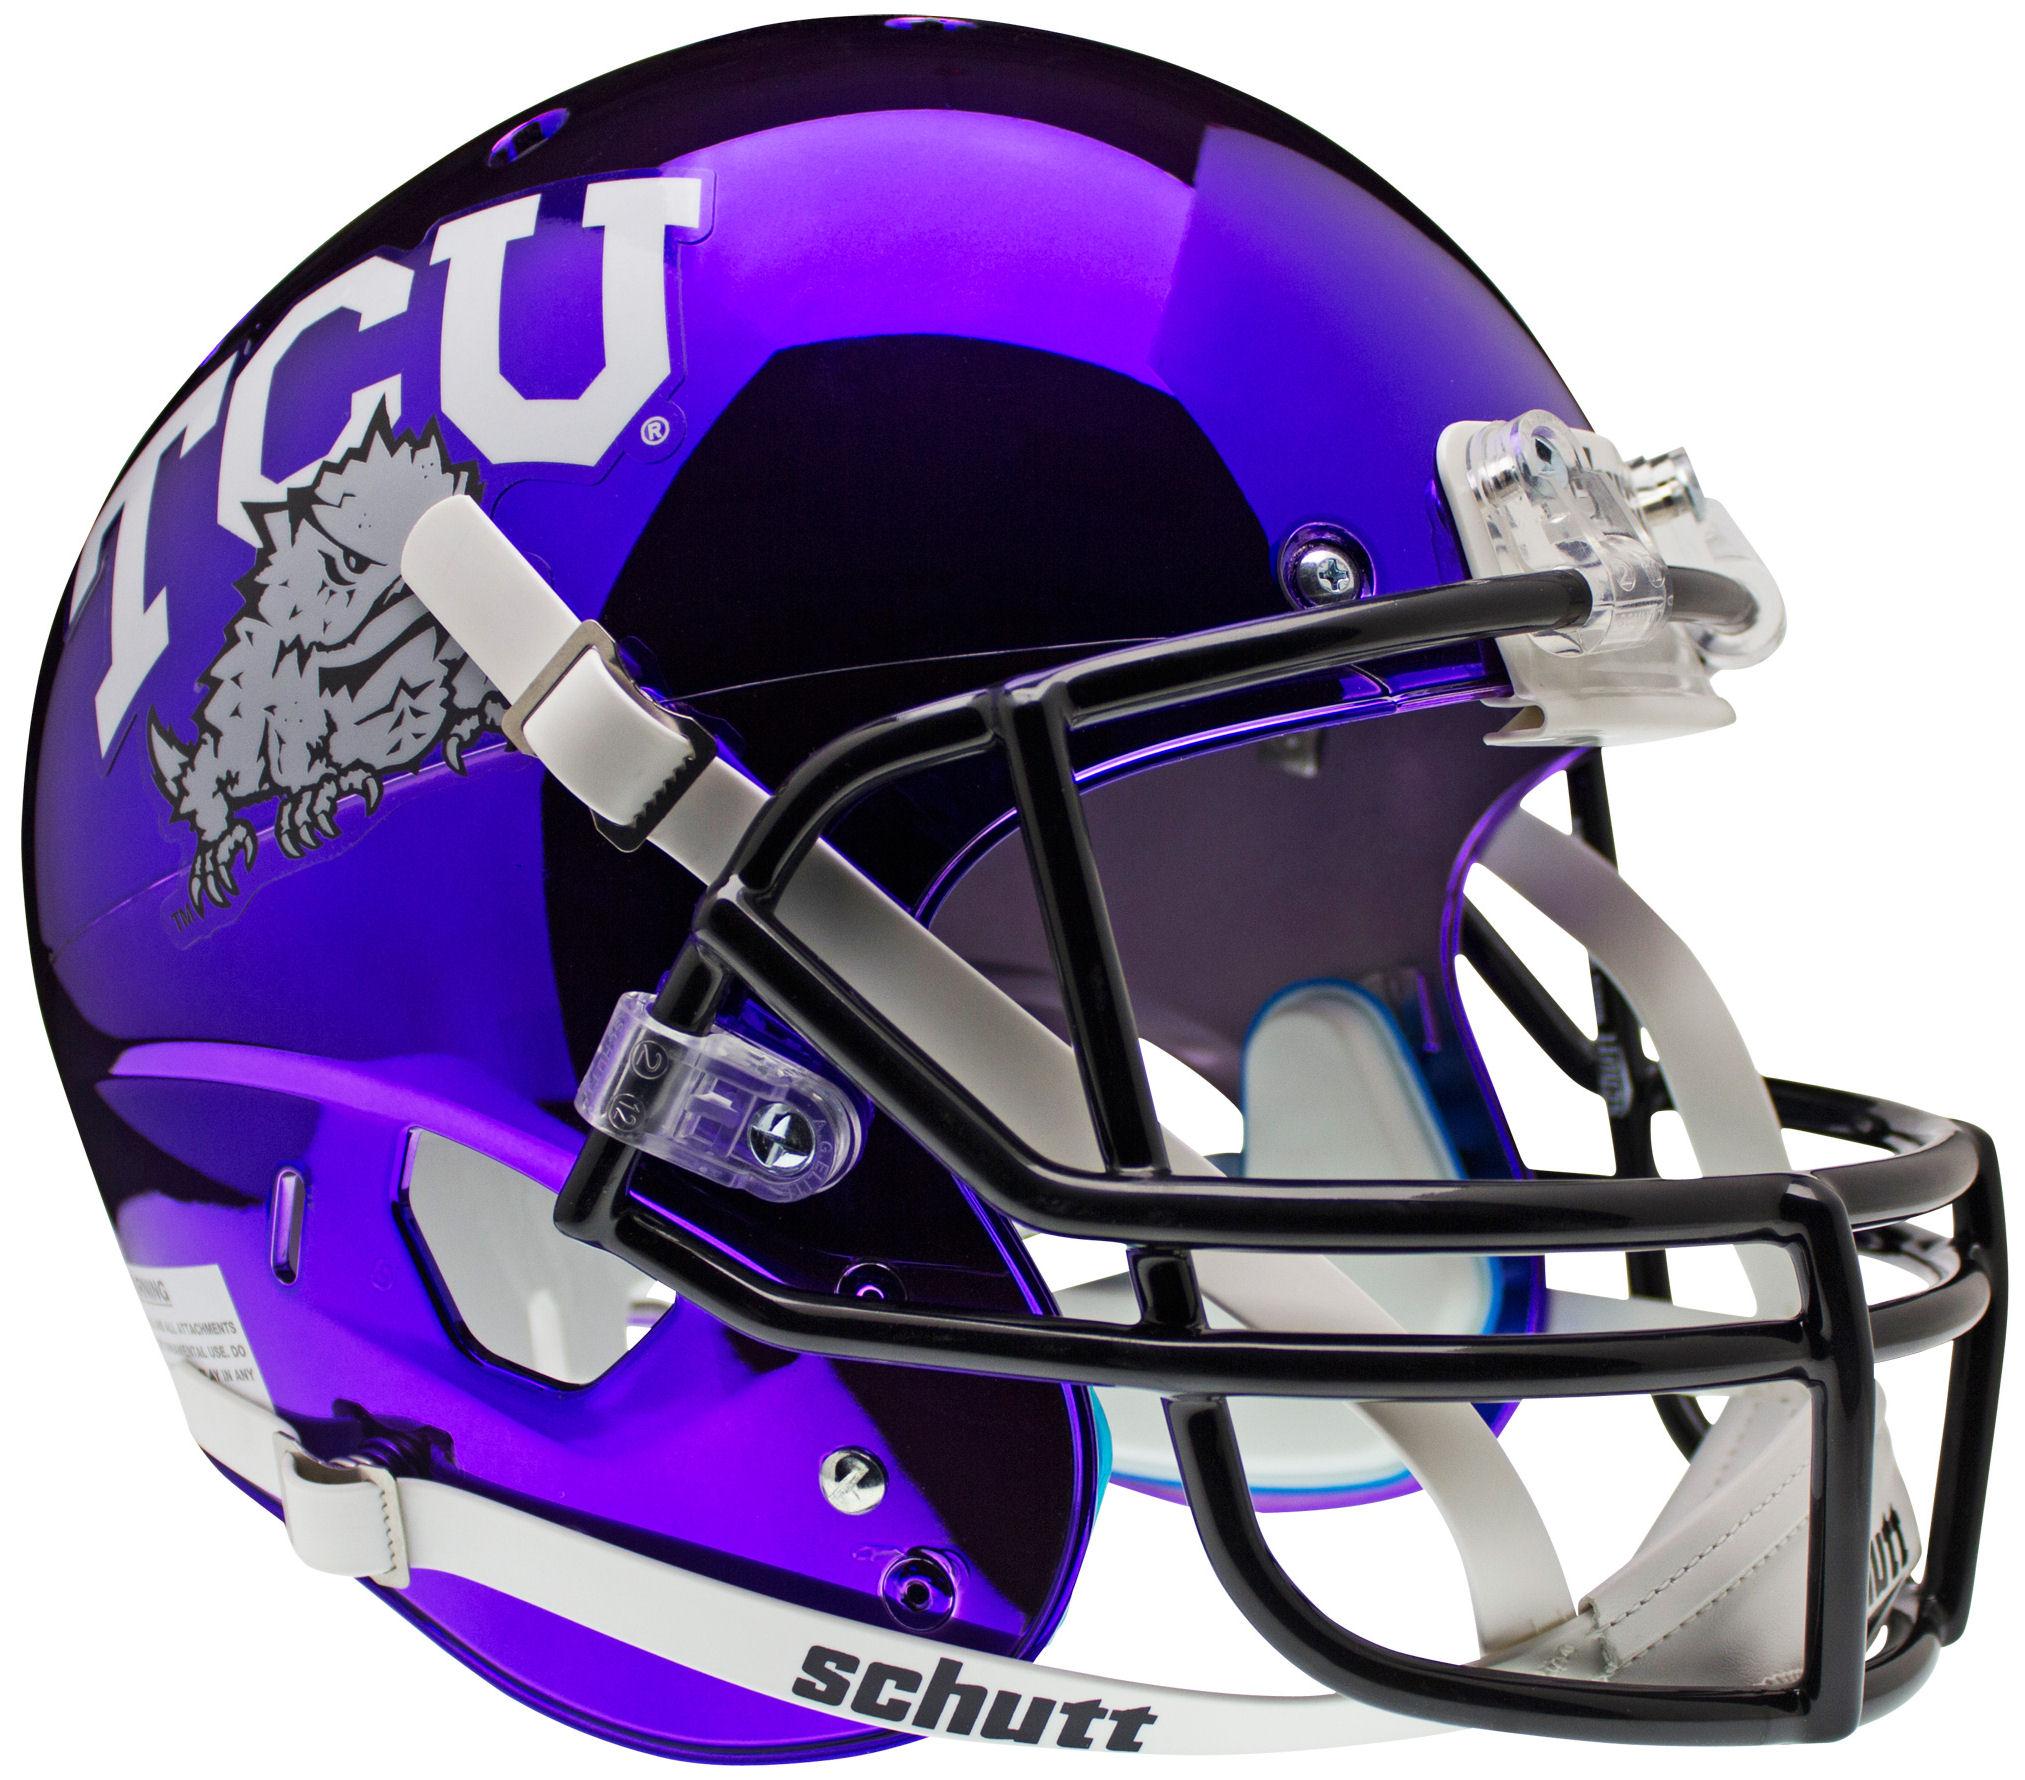 TCU Horned Frogs Full XP Replica Football Helmet Schutt <B>Chrome</B>